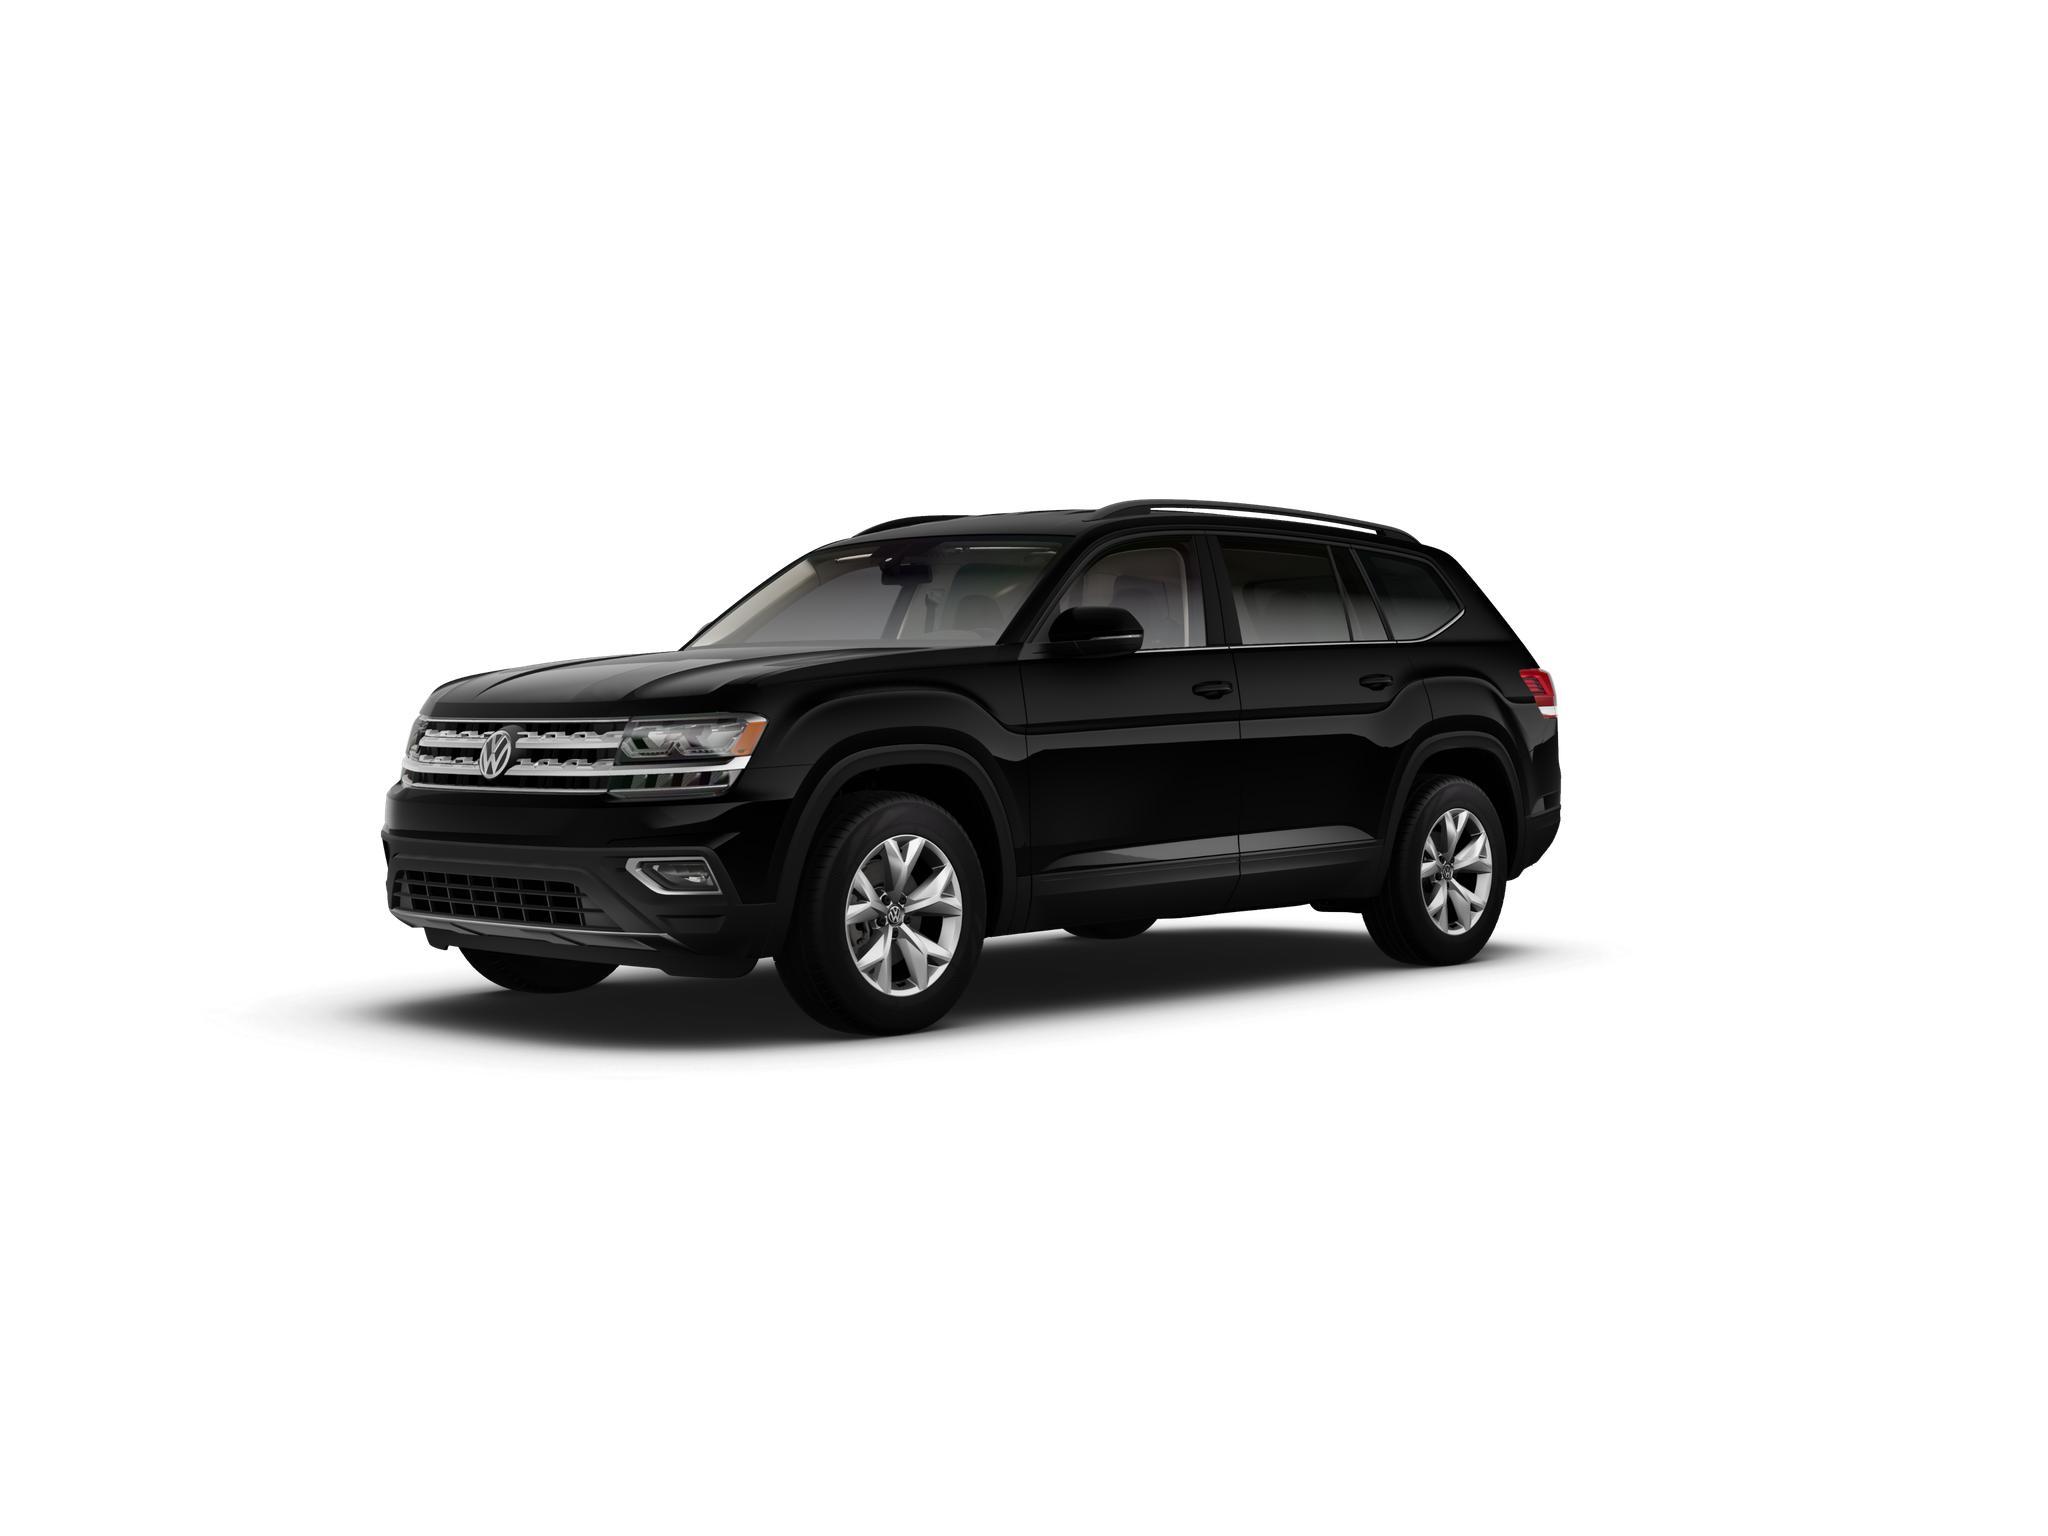 Volkswagen Teramont Внедорожник (Status)